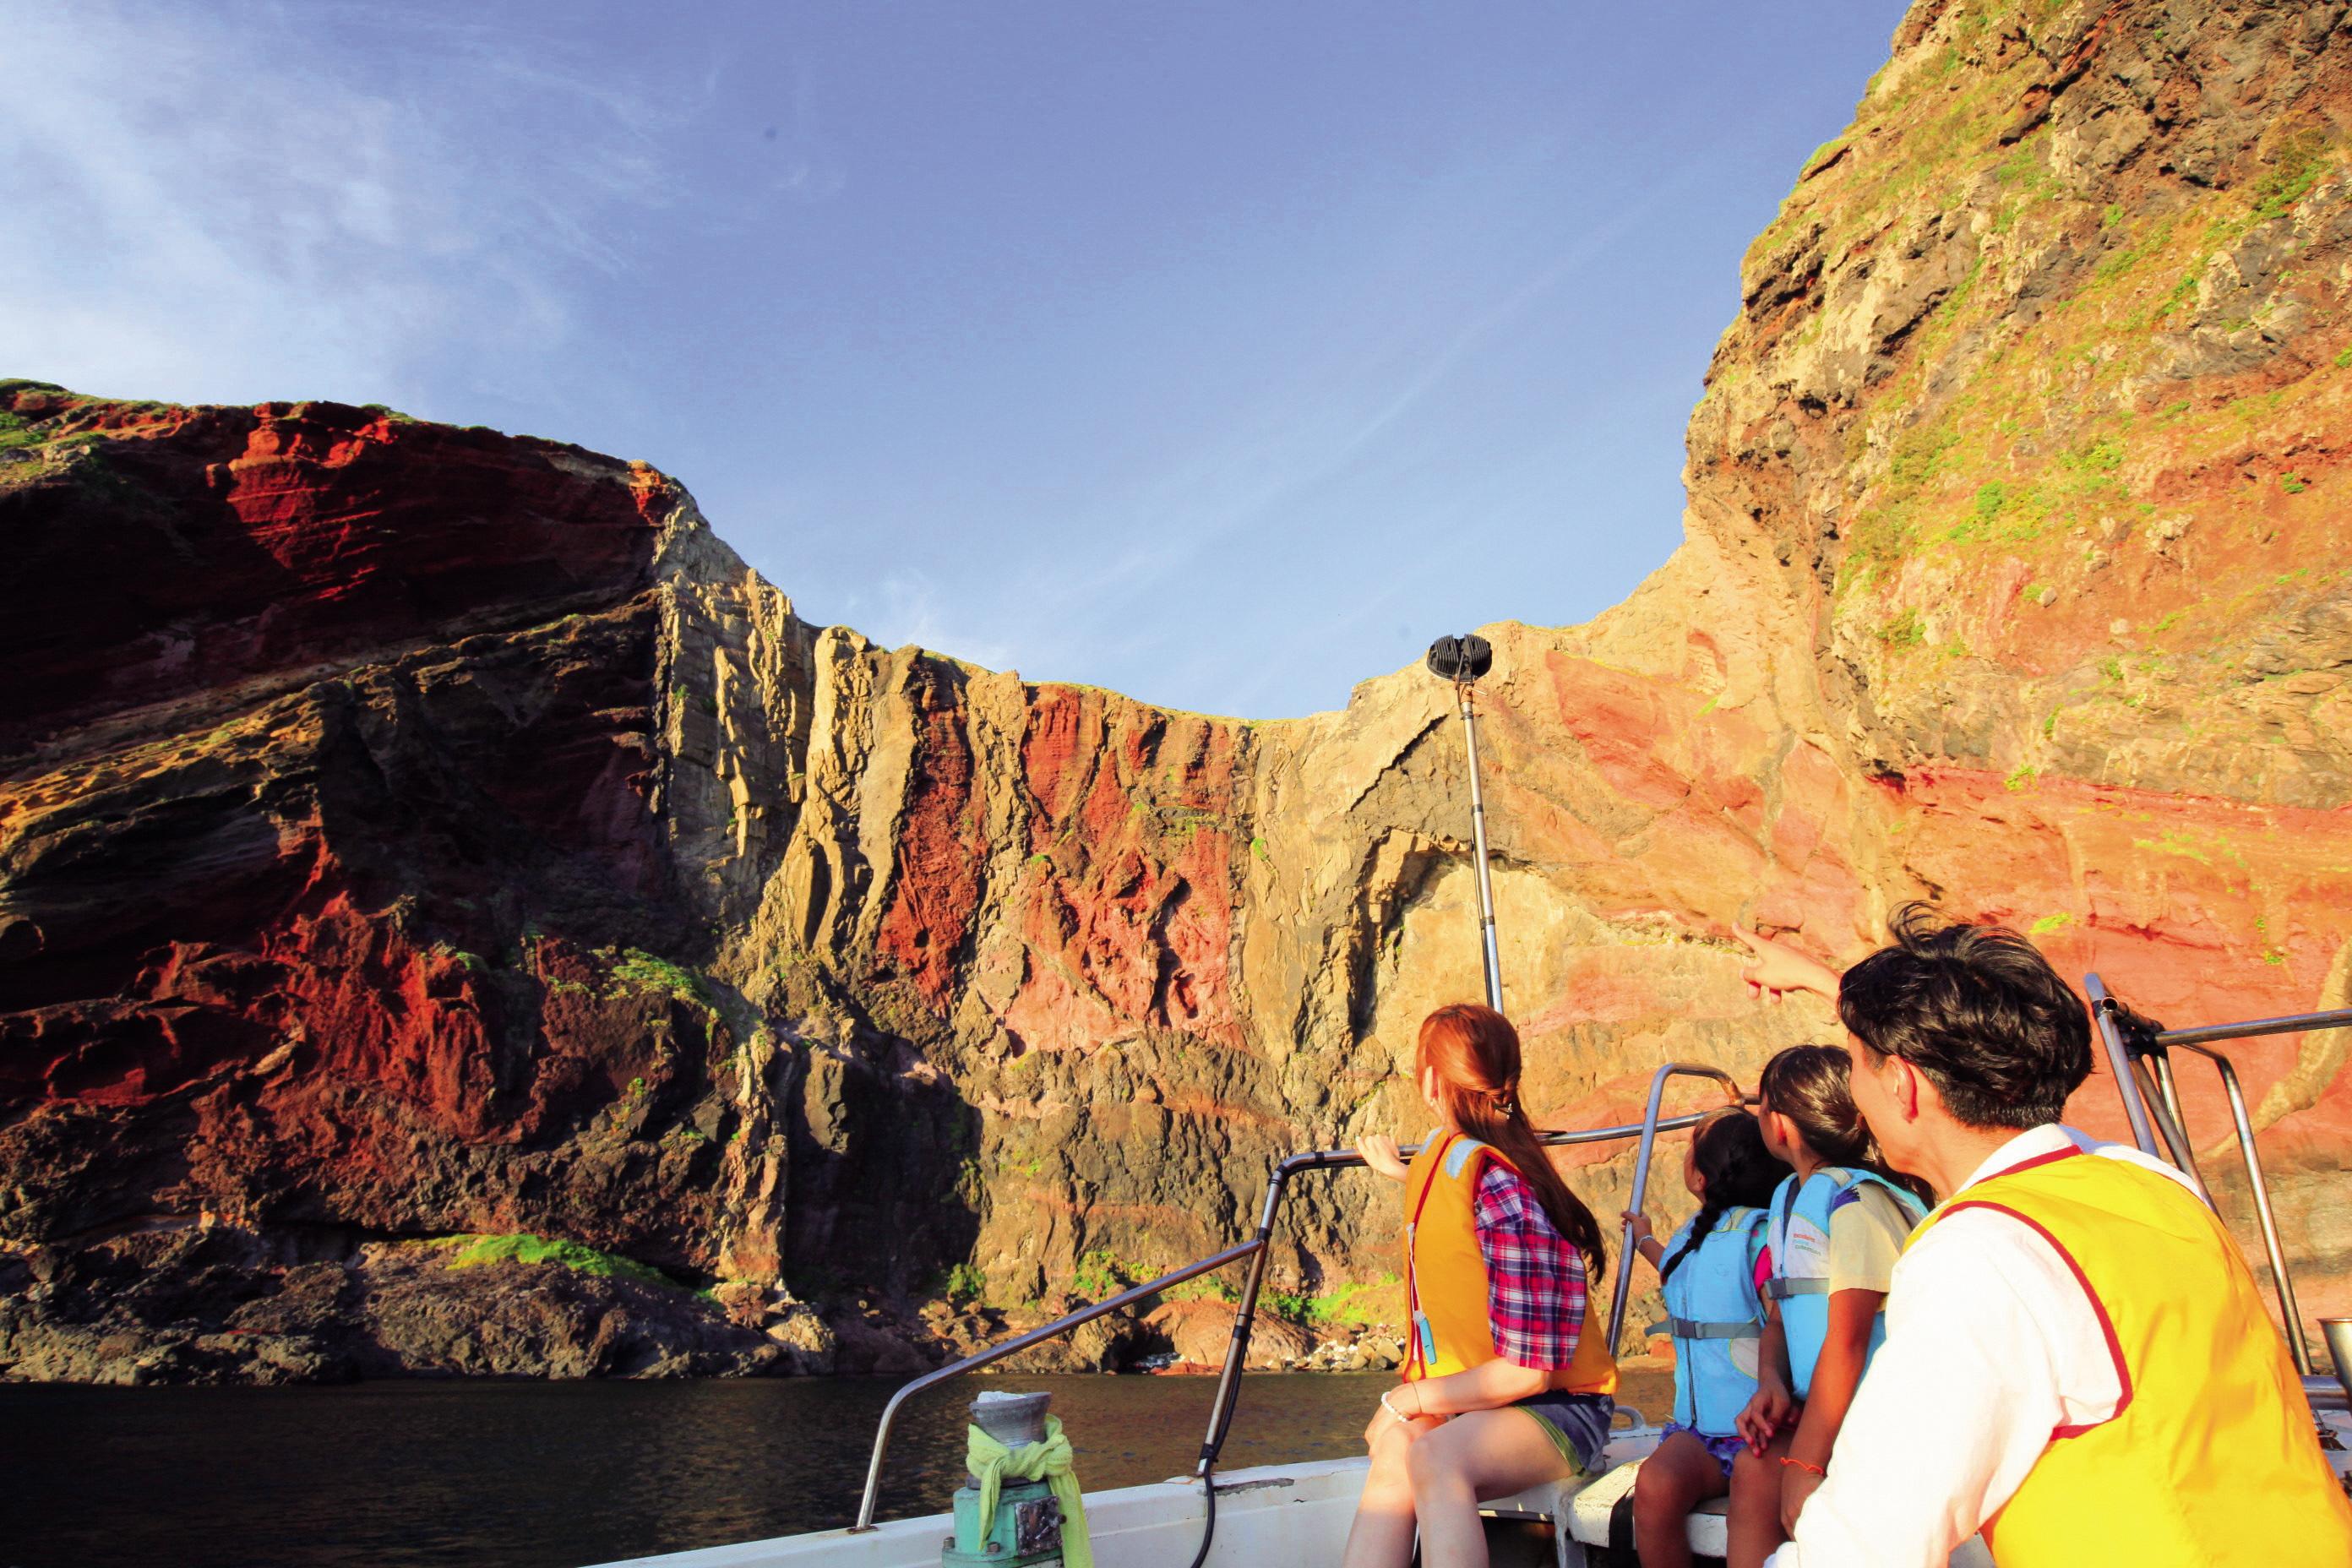 Red Cliff (sekiheki)